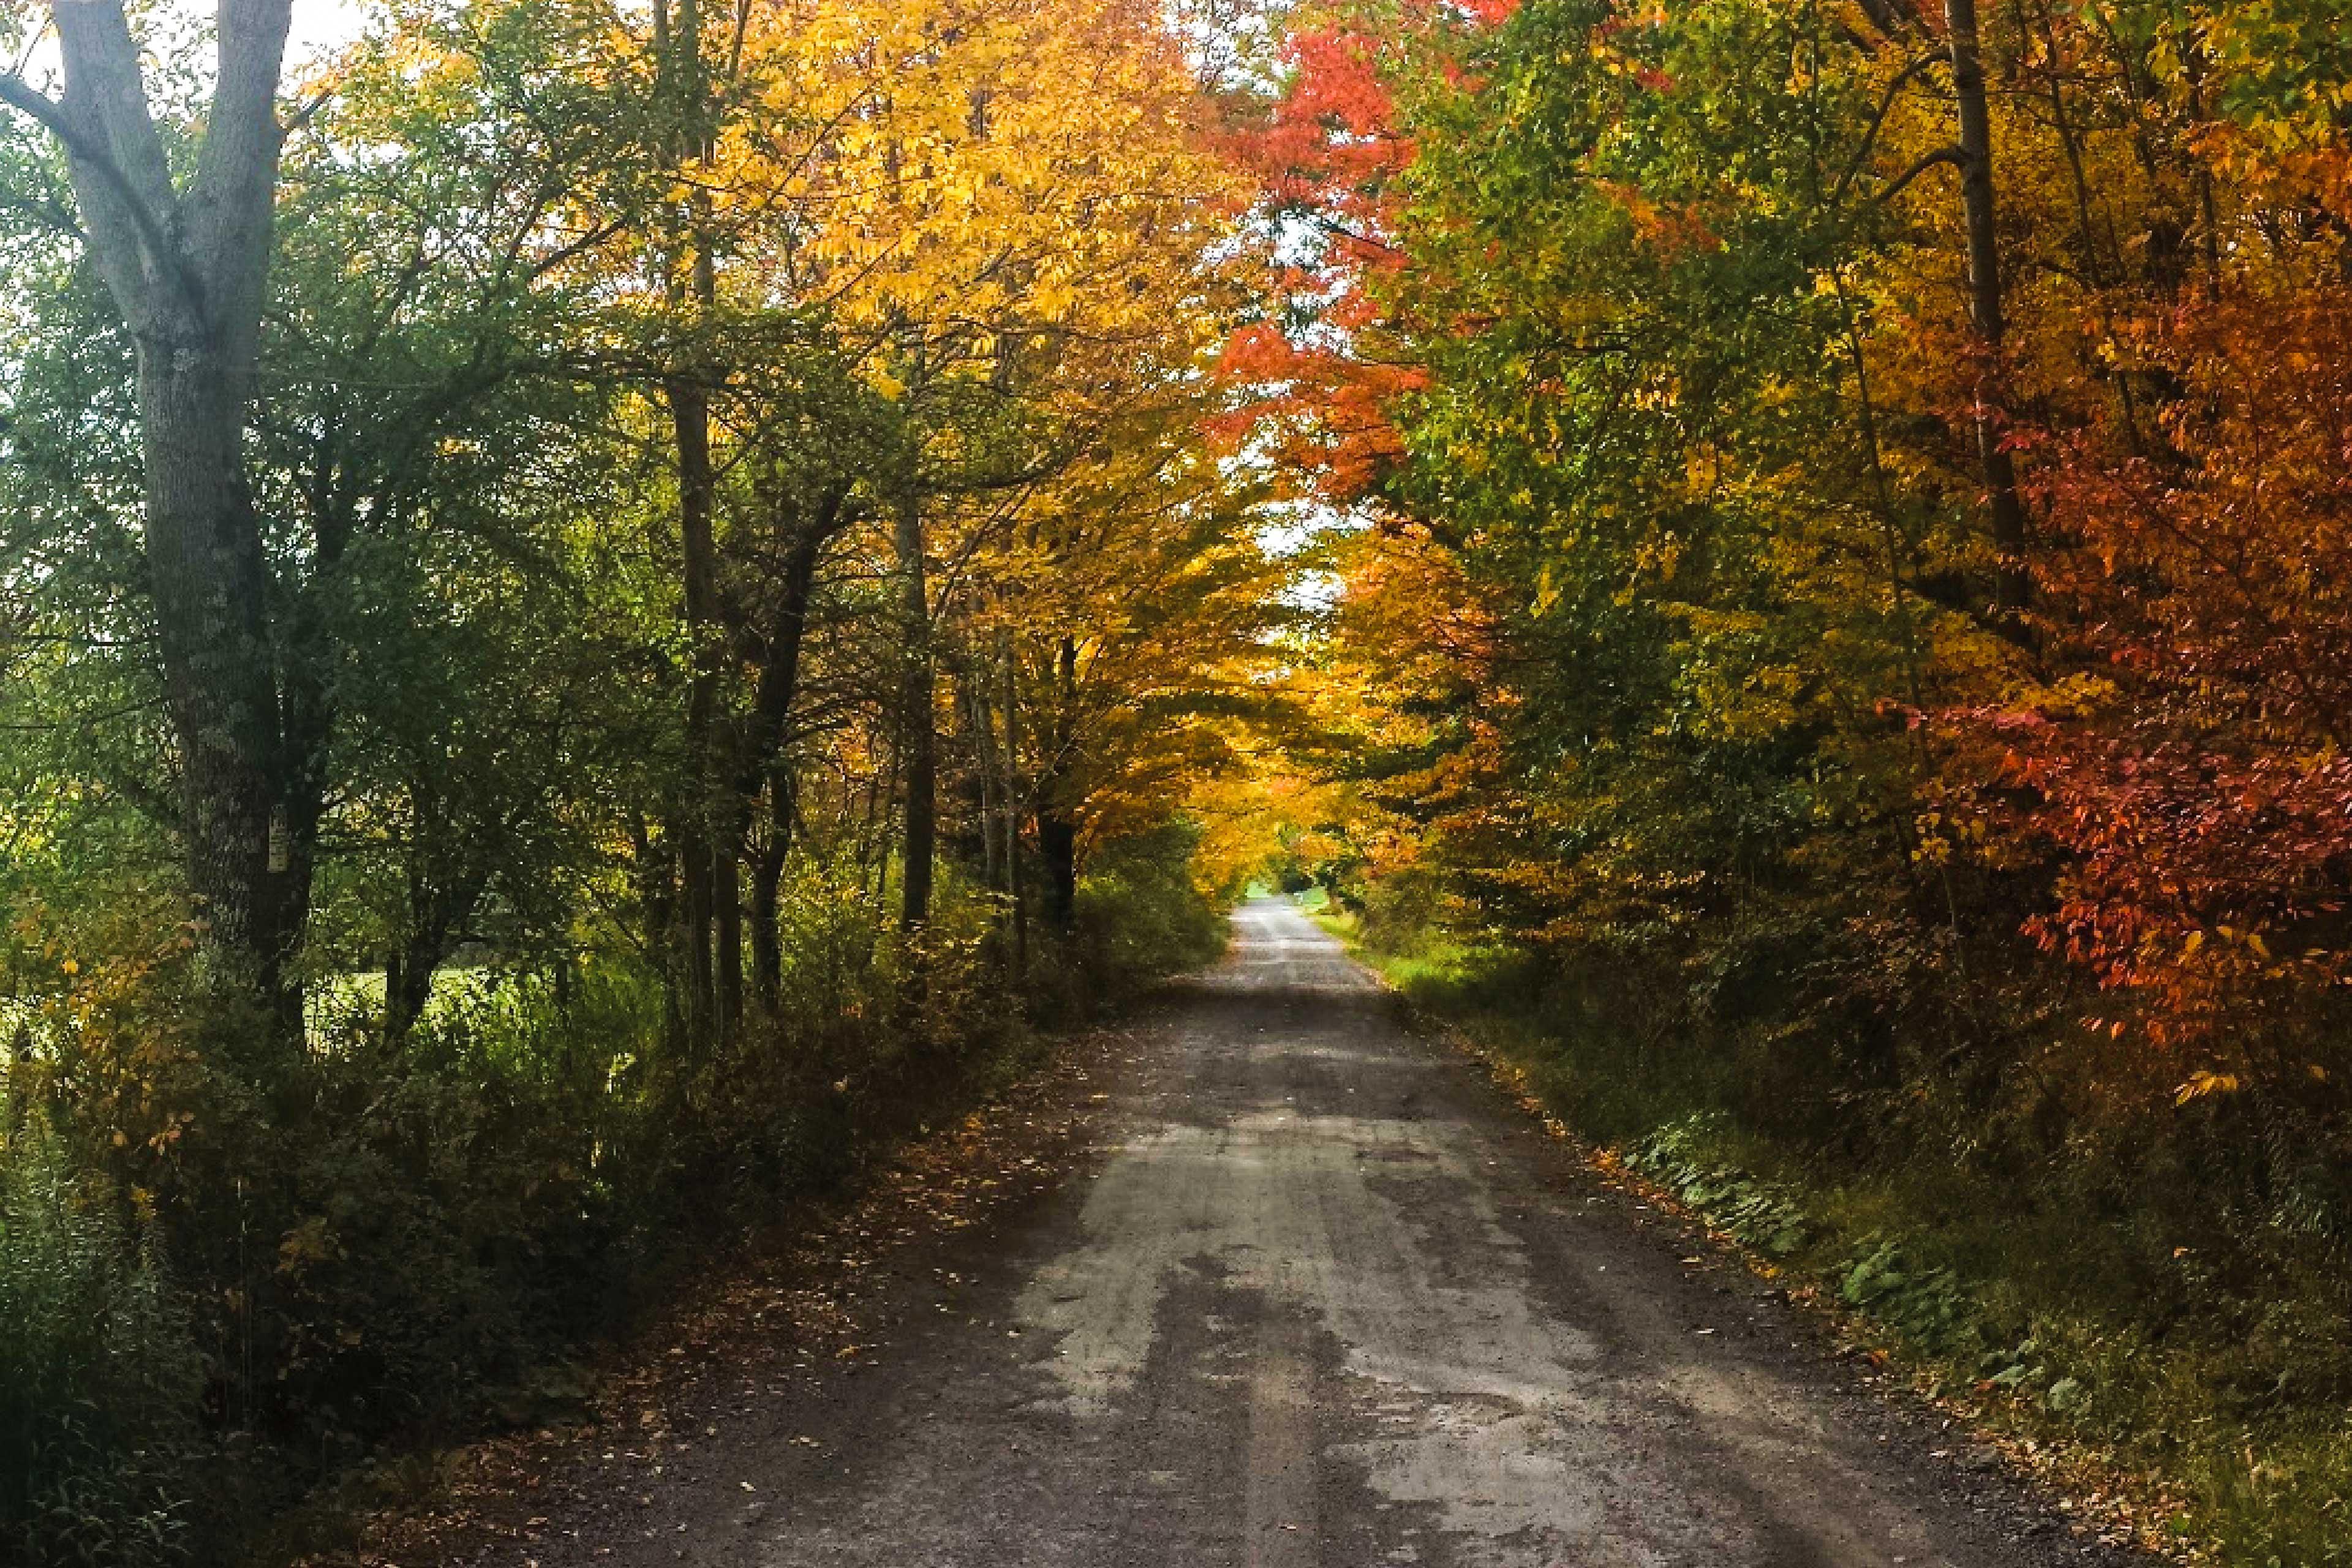 Autumn Drive up to Lazy Bear Lodge